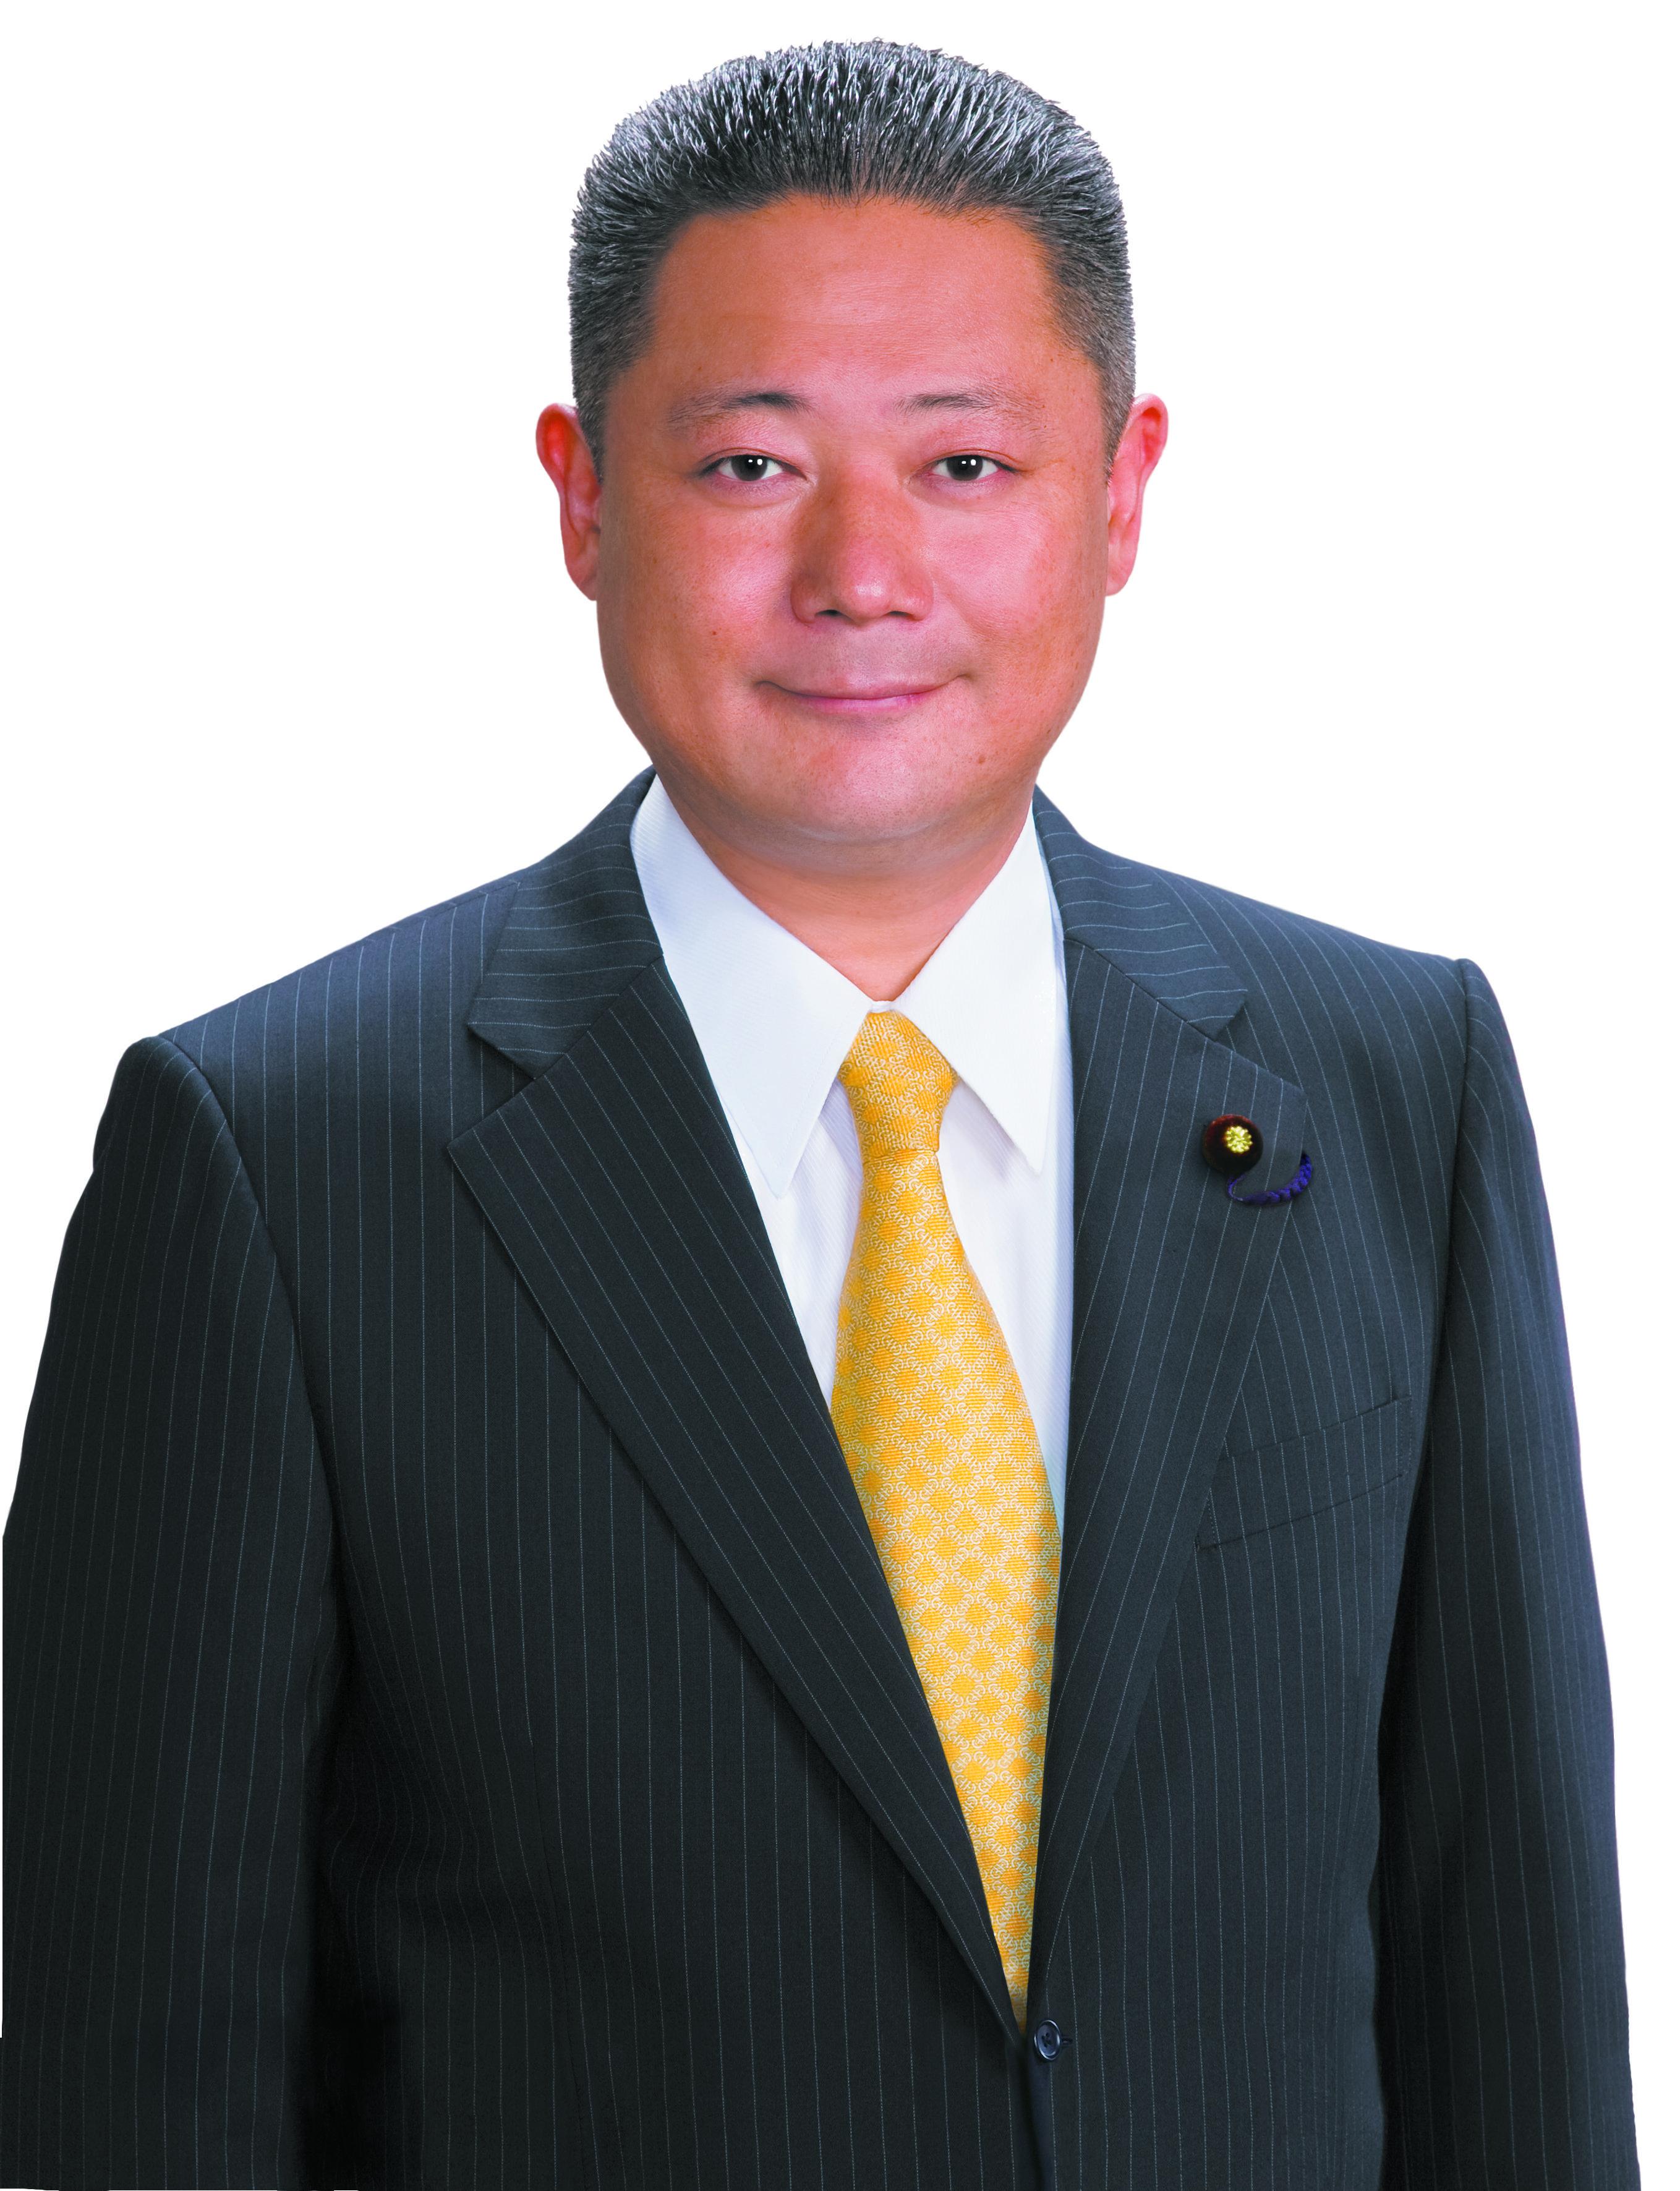 NHK「日曜討論」 馬場伸幸幹事長 生出演のお知らせ